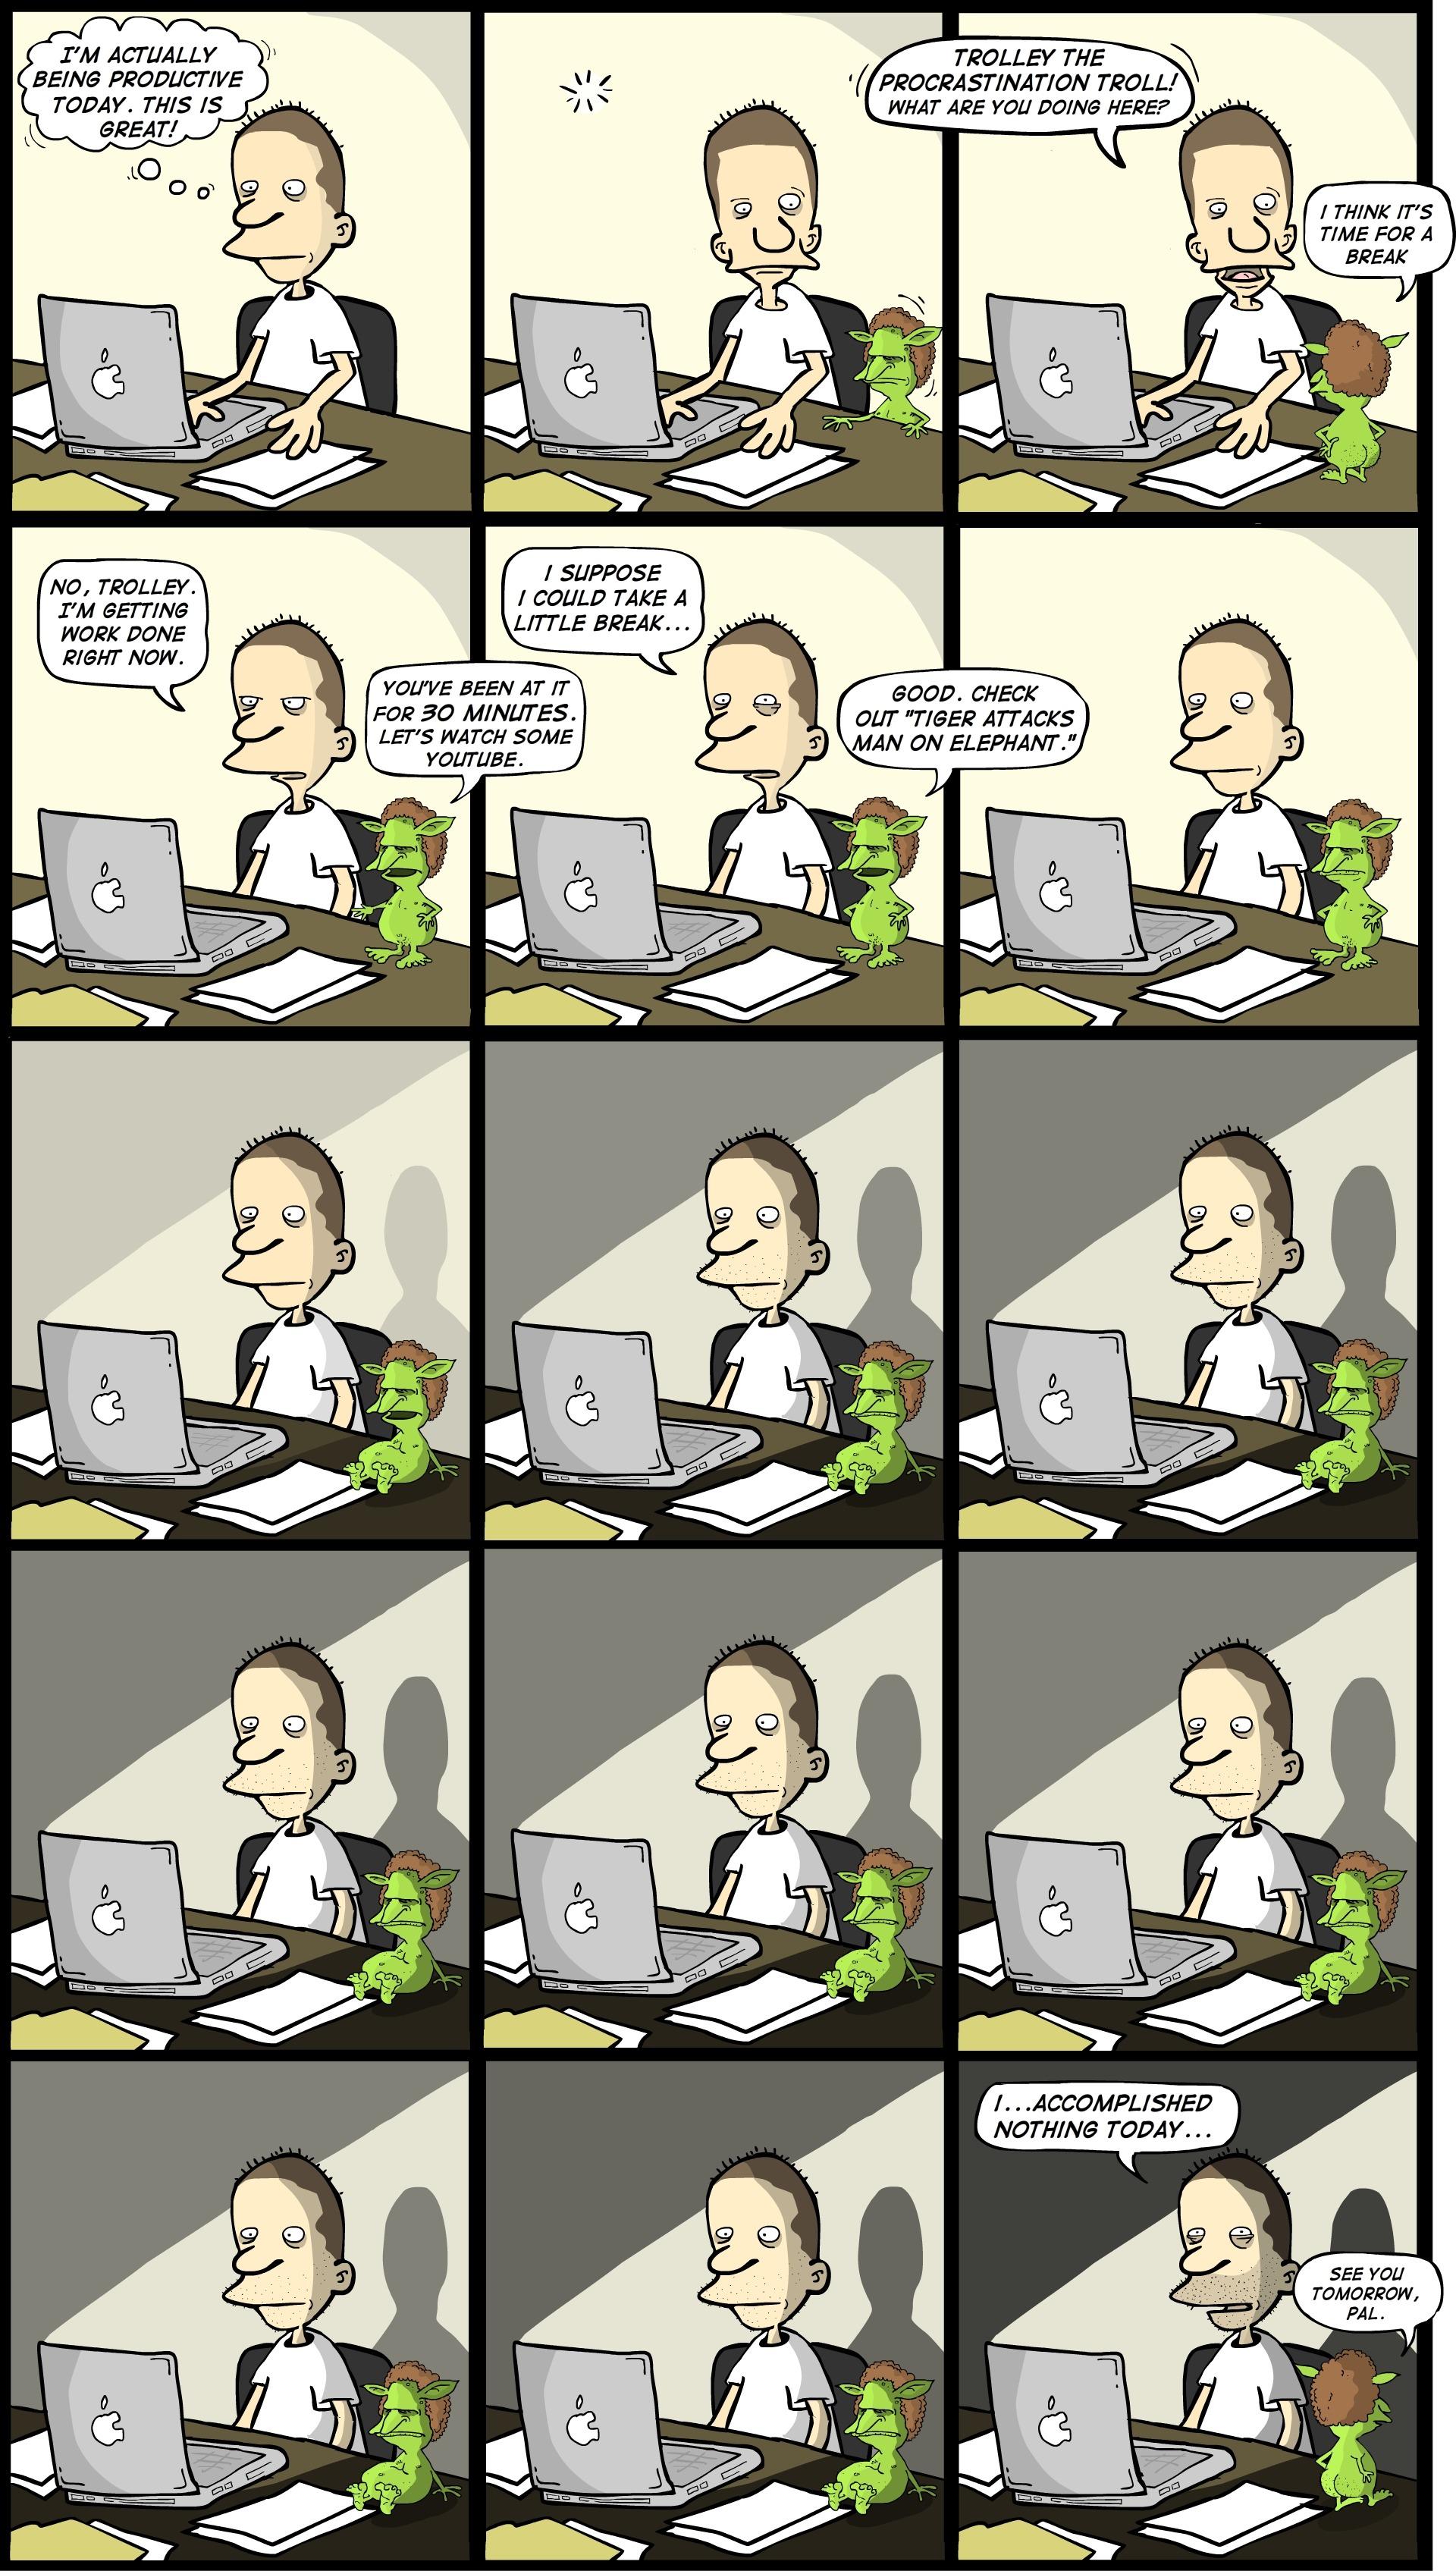 procrastination_troll